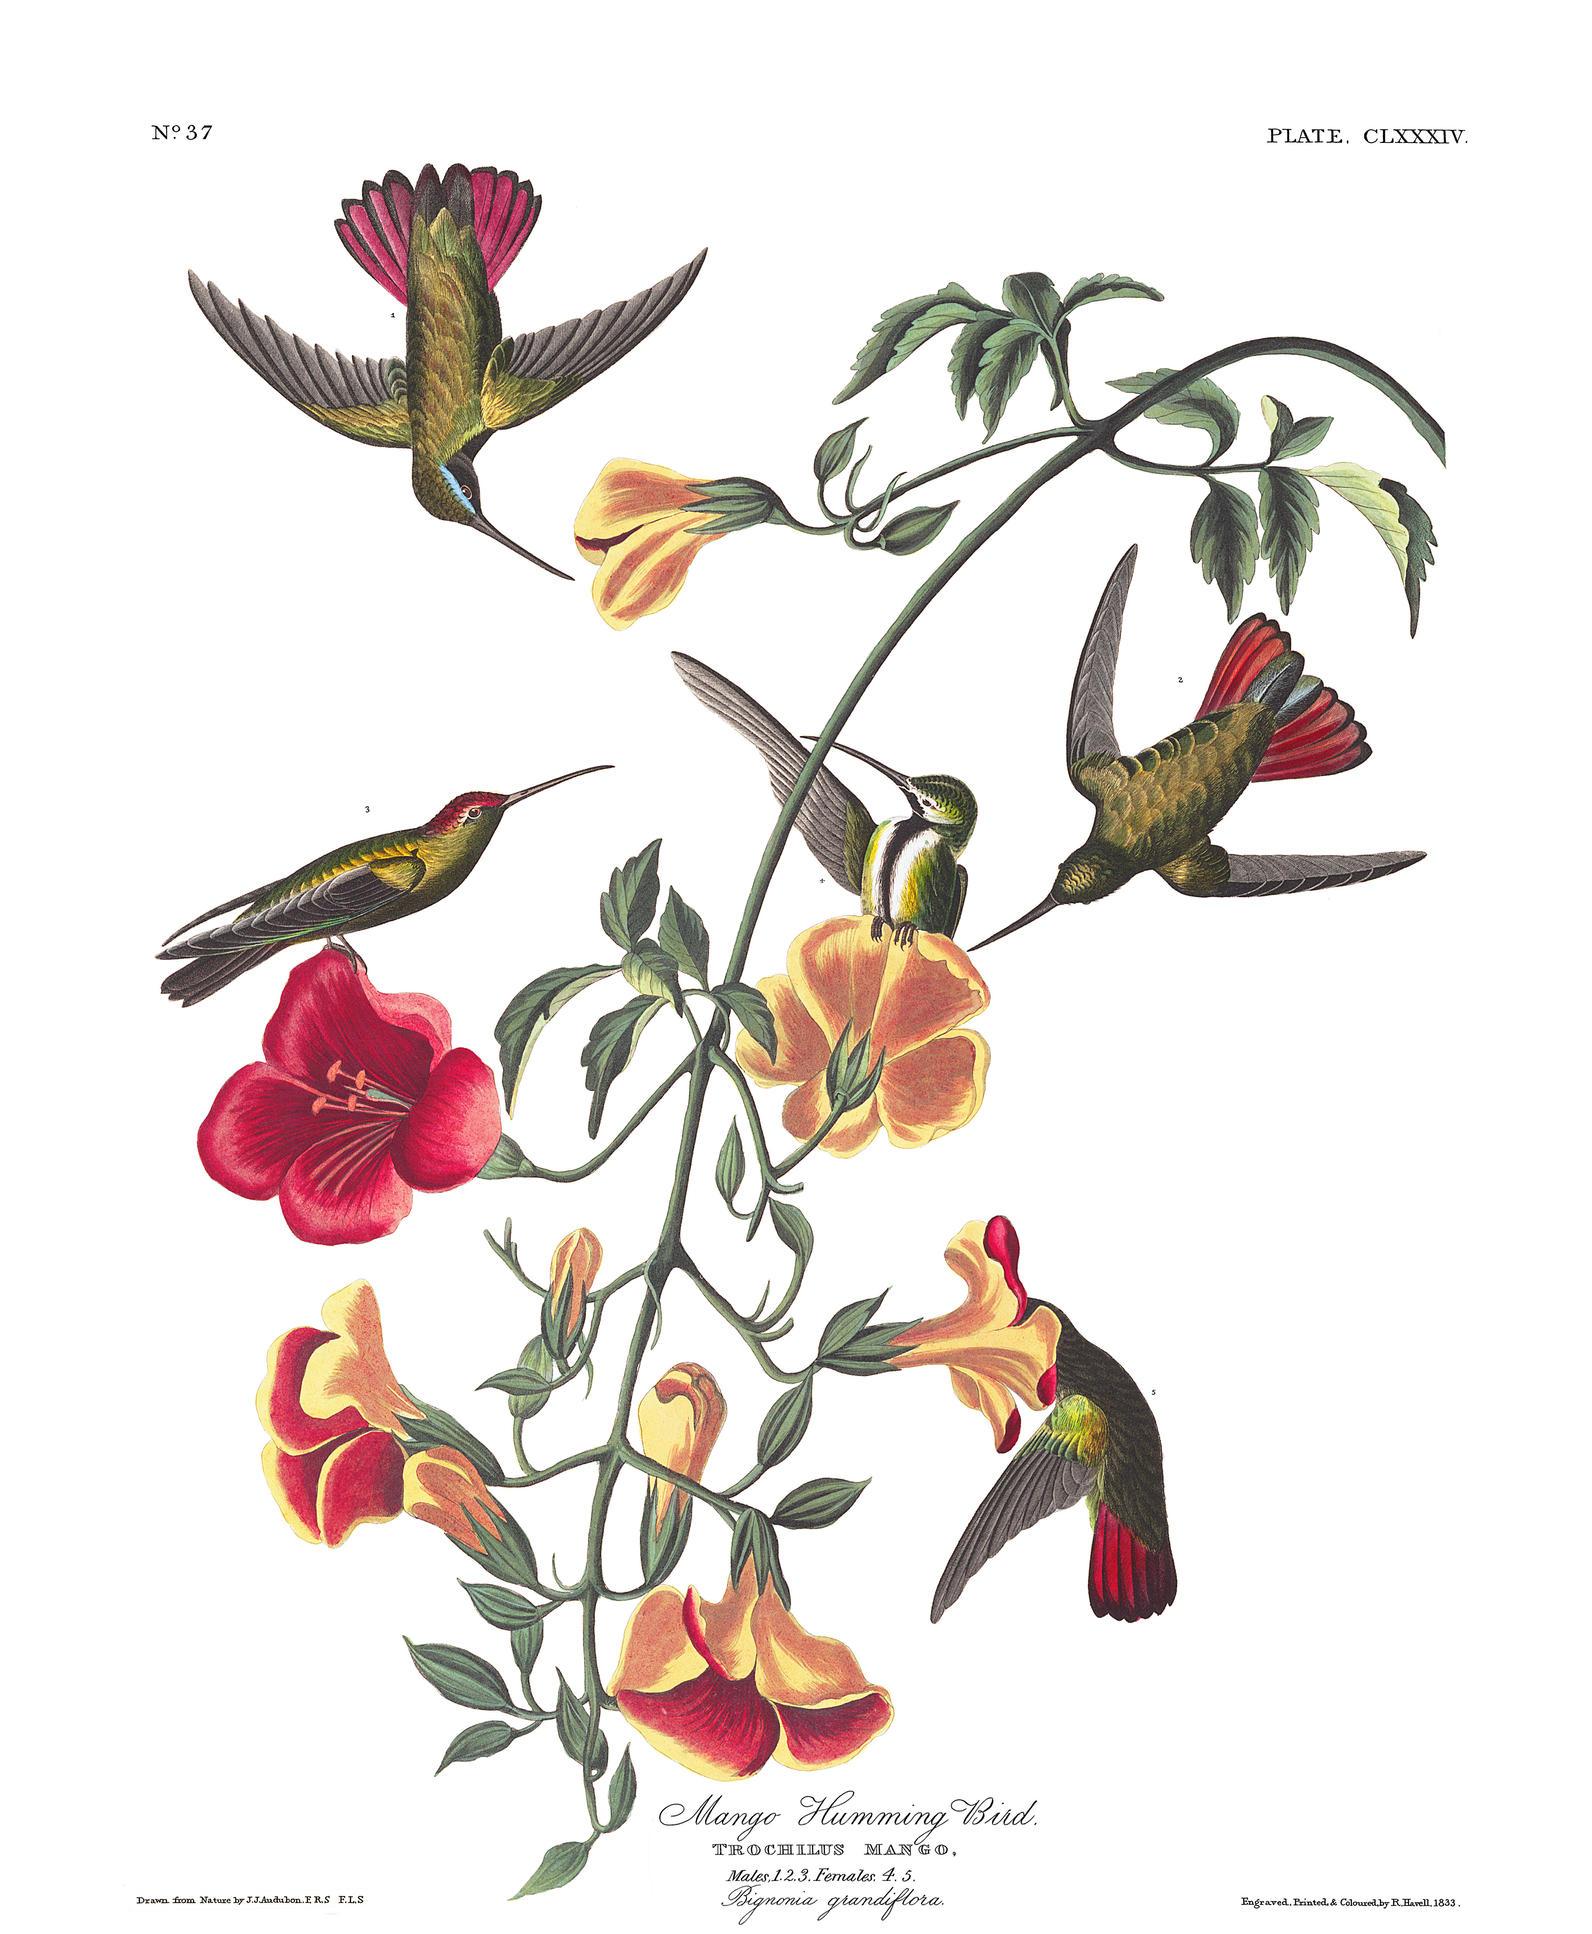 Audubon's Hummingbirds 1833